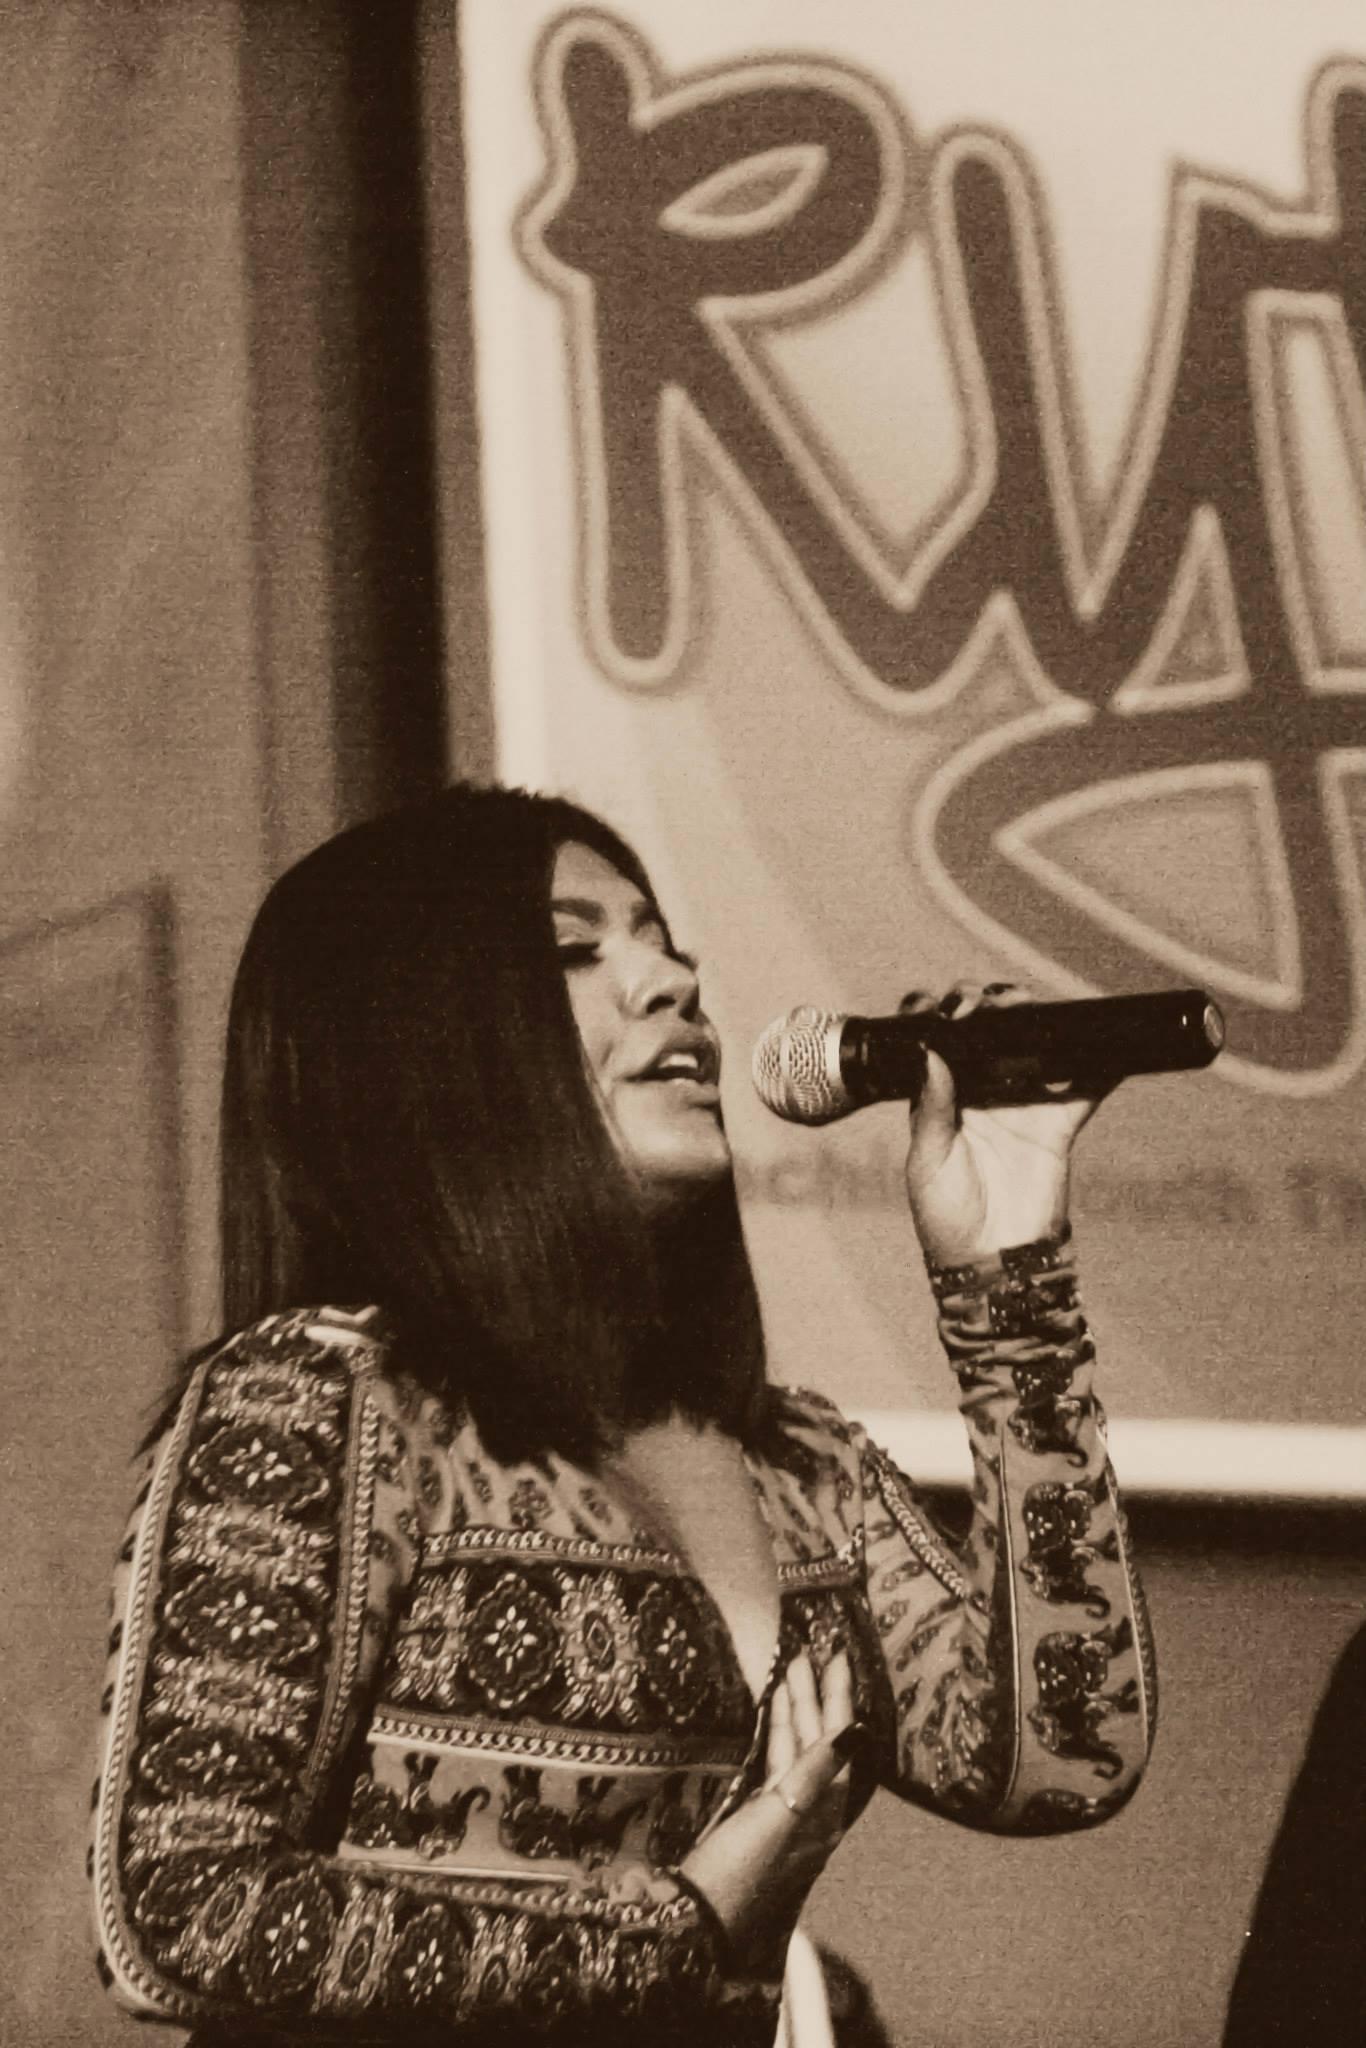 Jocelyn Avalos